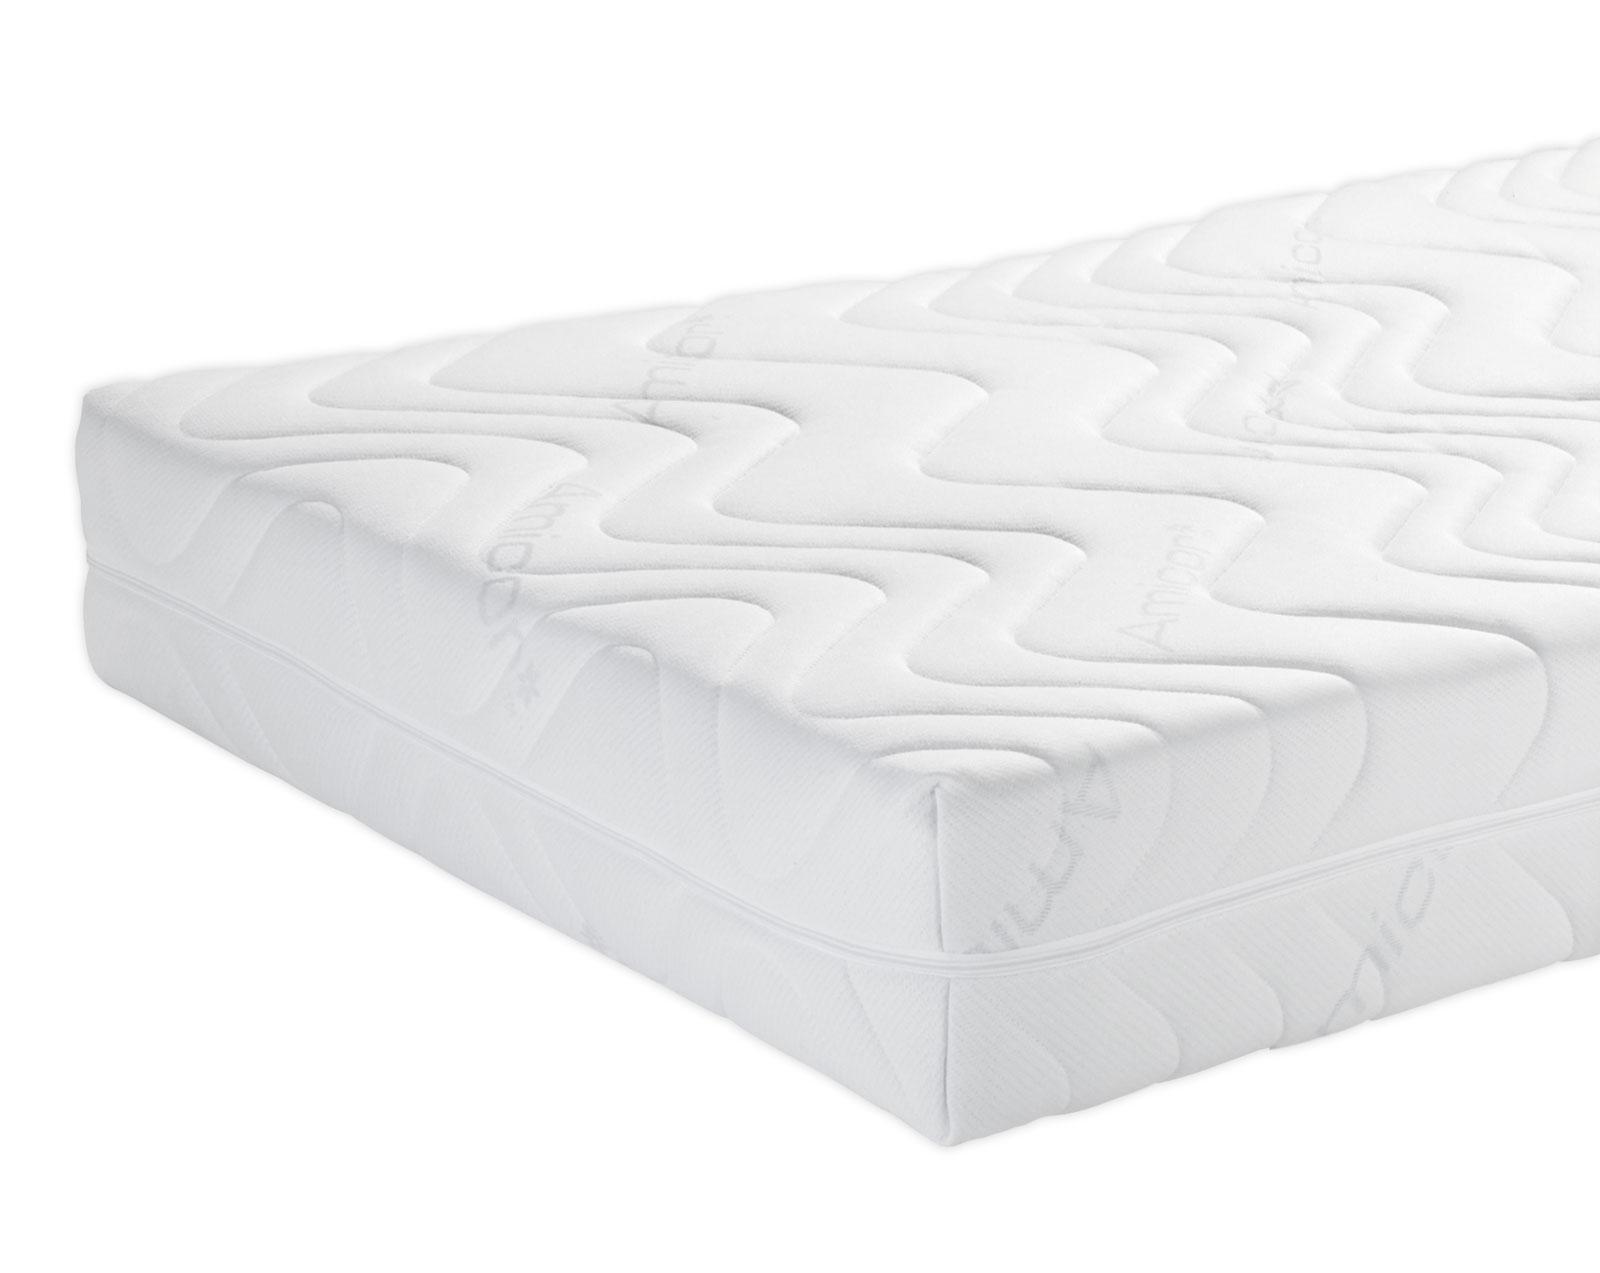 allergiker kaltschaummatratze bis 160 kg orthowell vital xxl. Black Bedroom Furniture Sets. Home Design Ideas